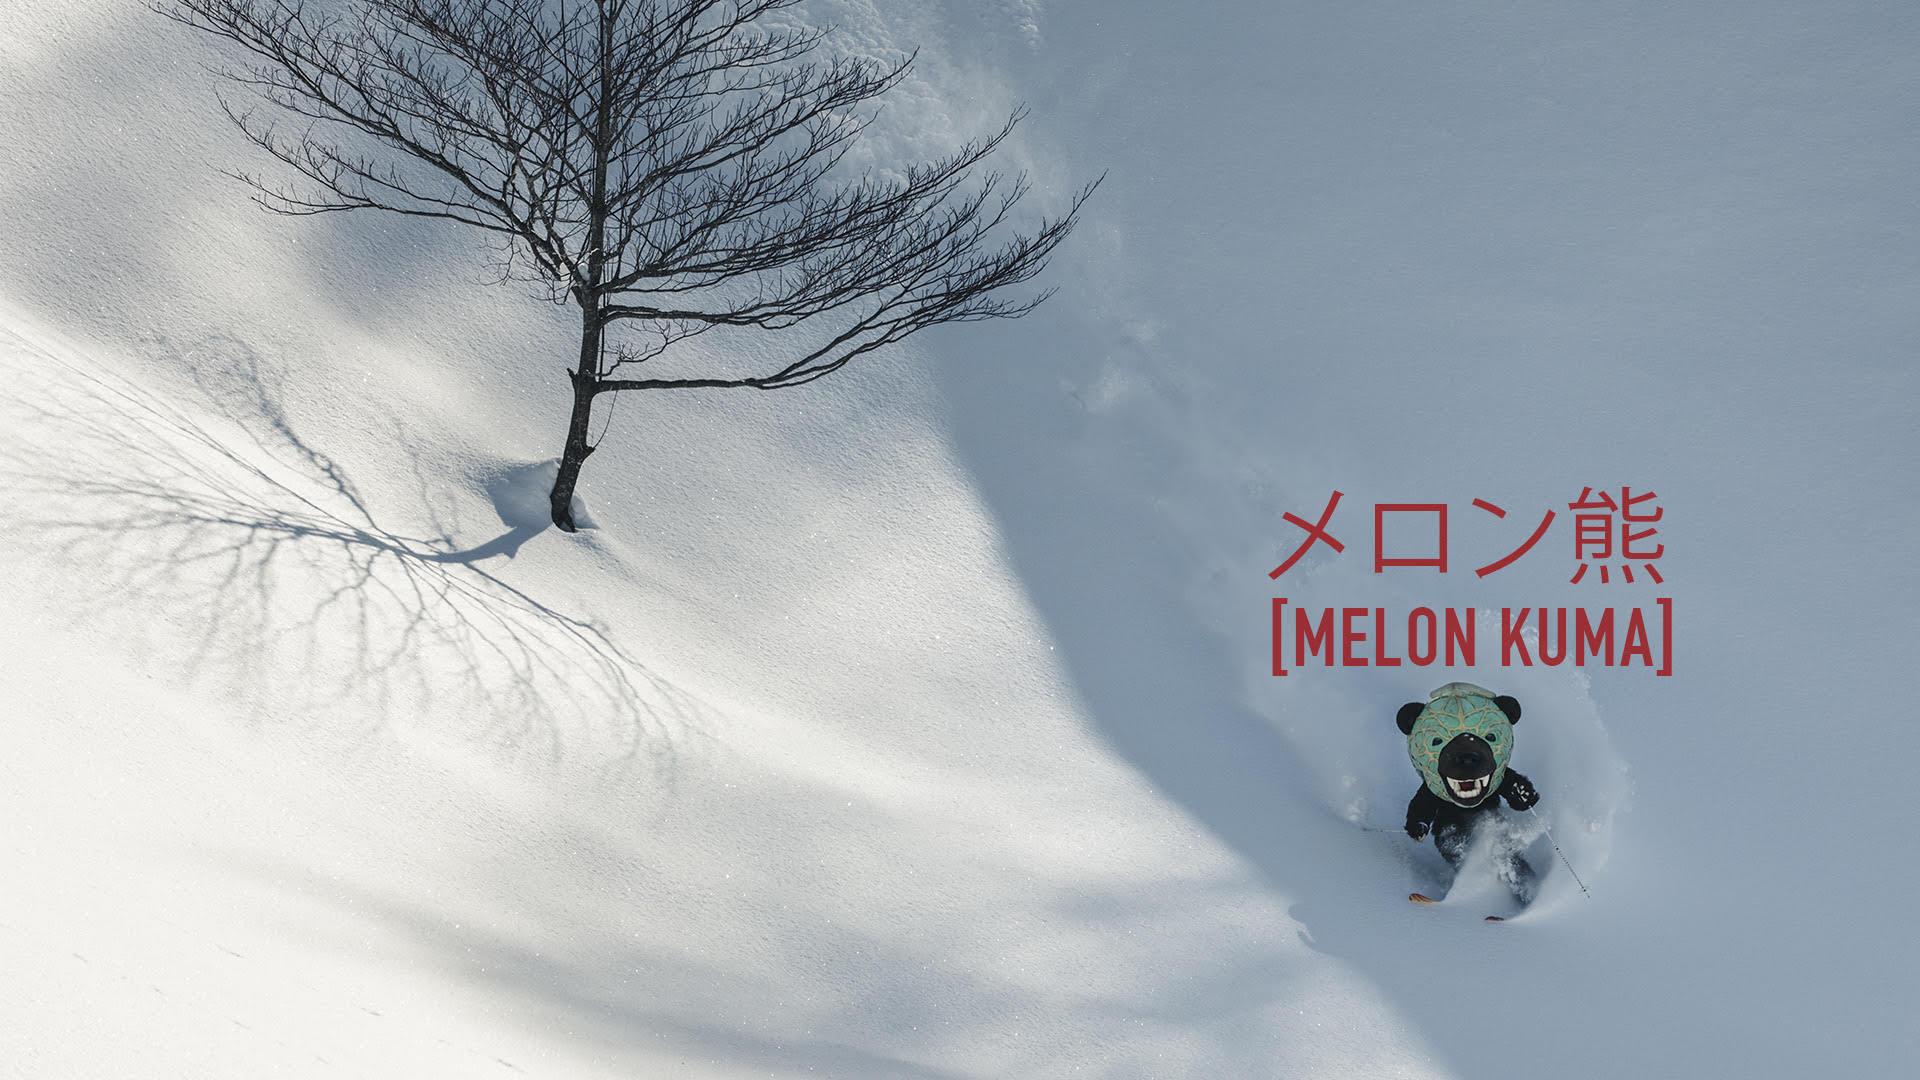 Yuabri Melon Kuma Promo video